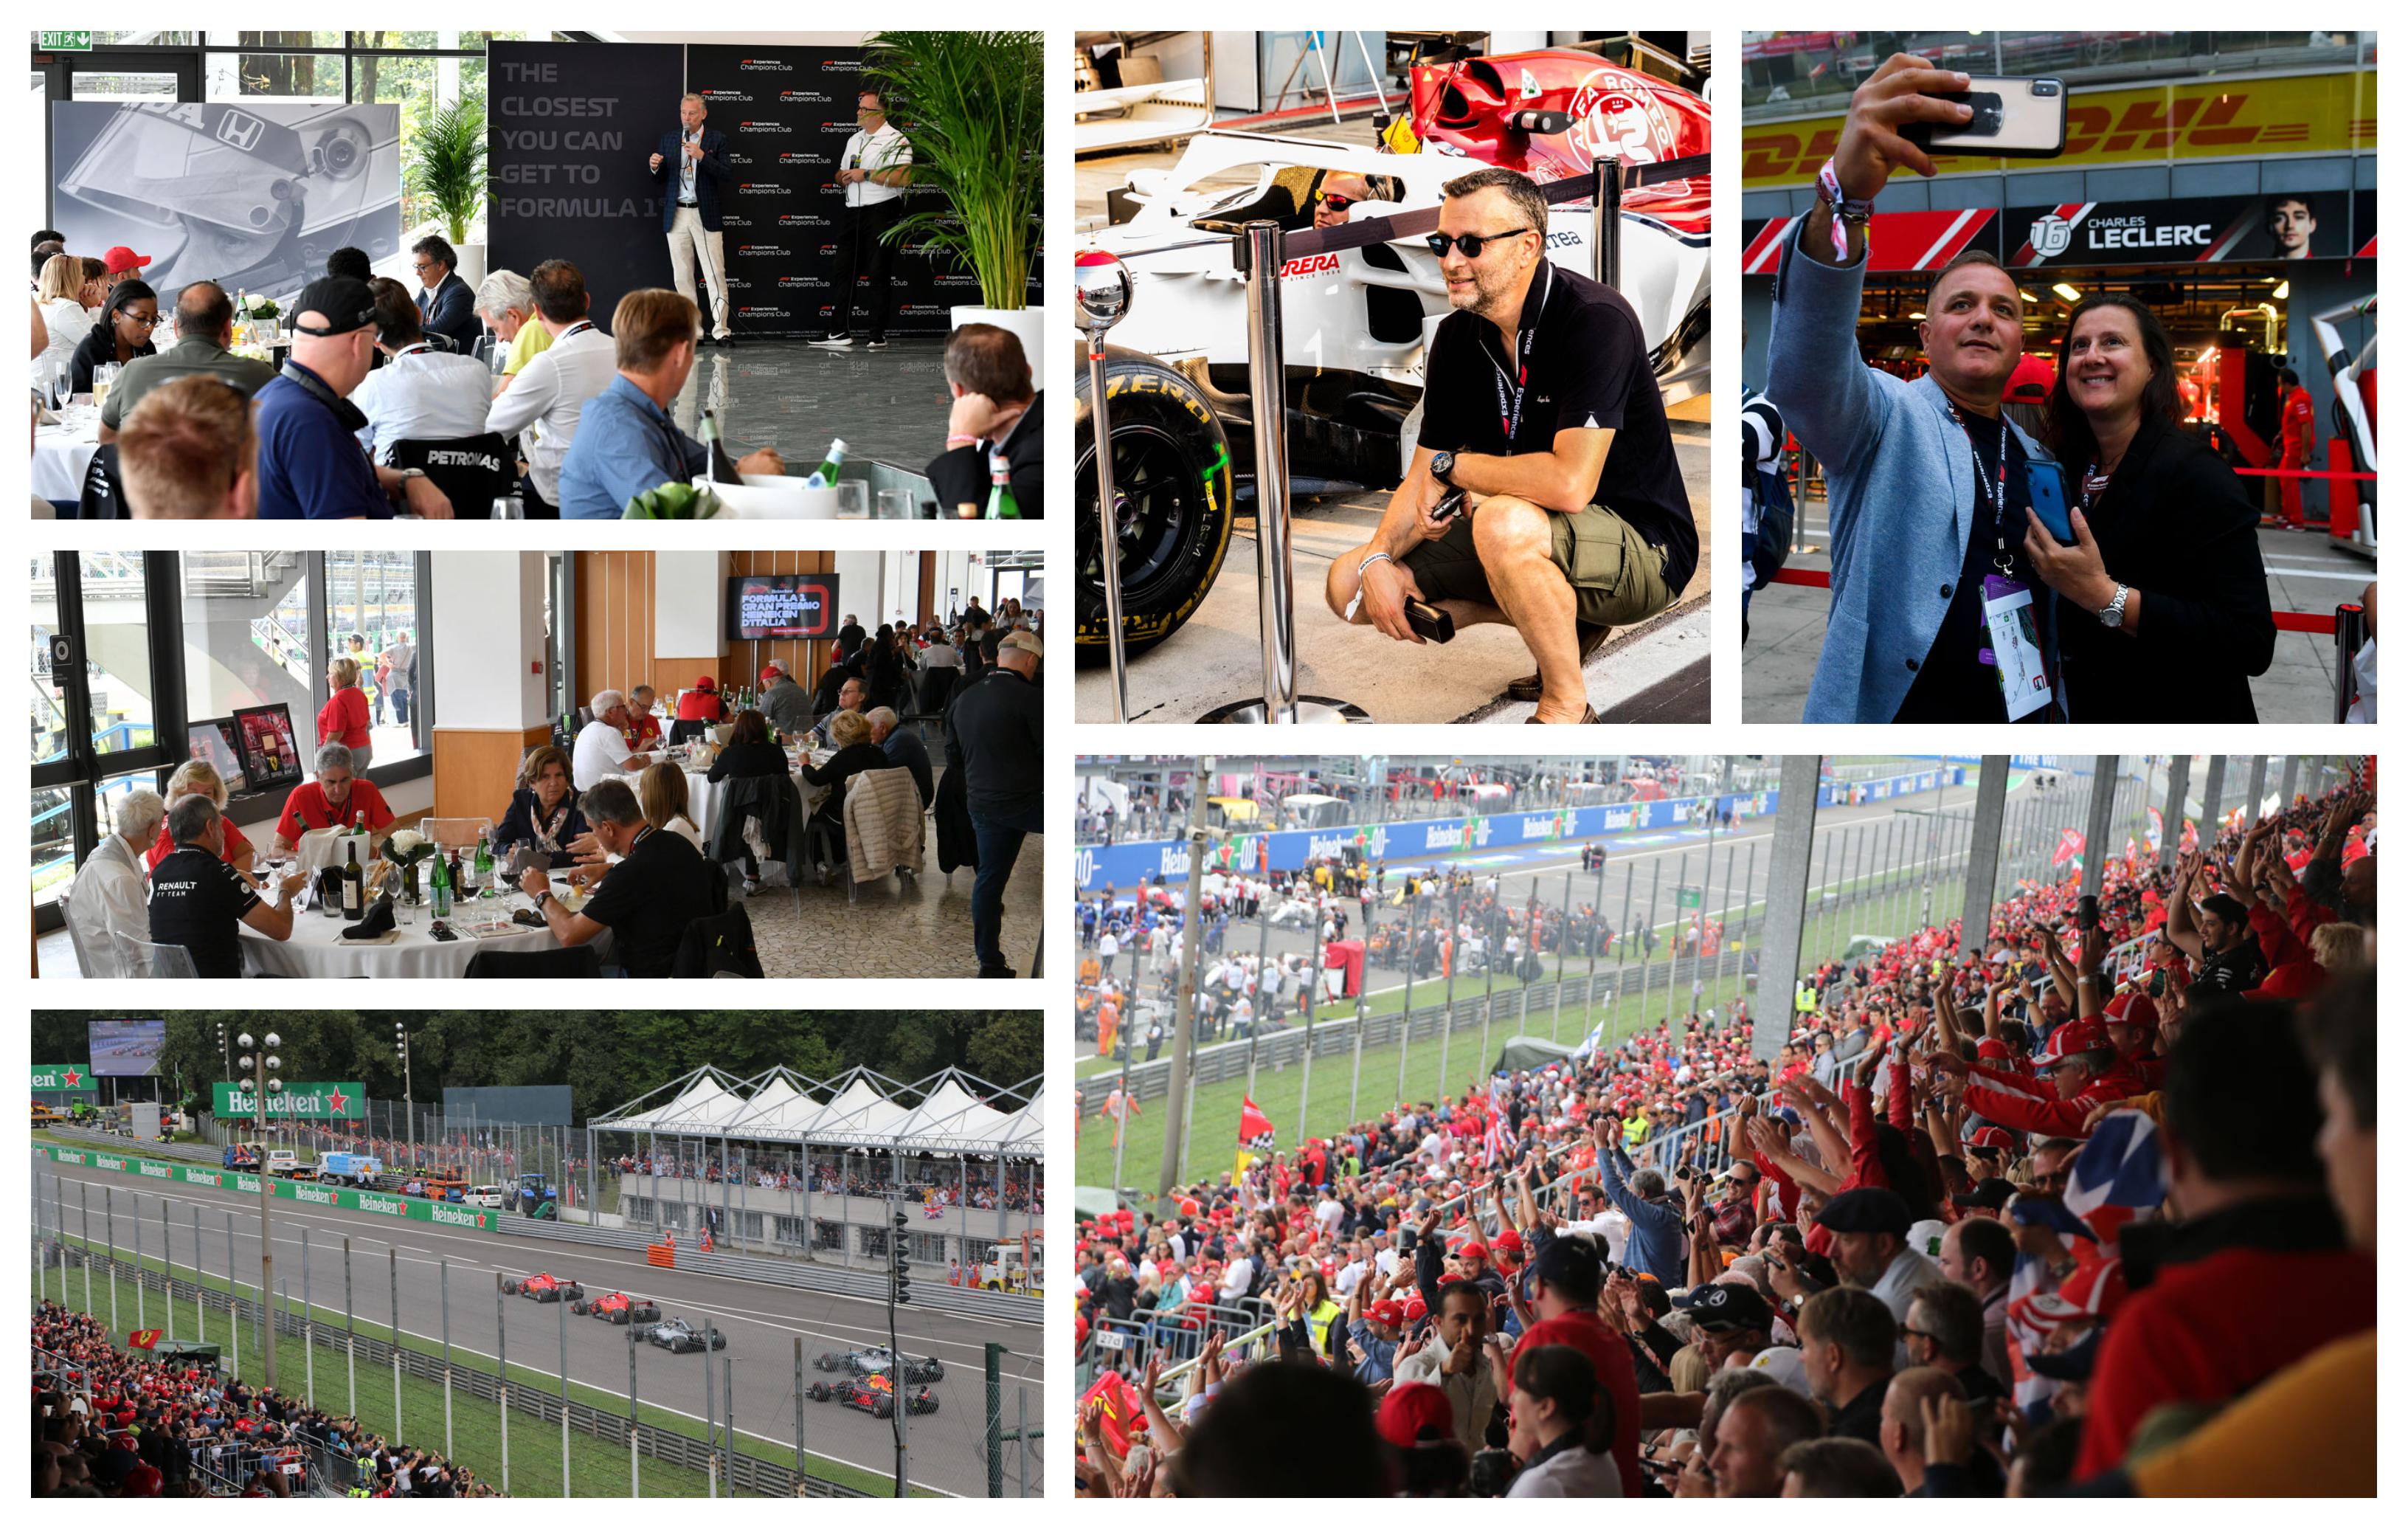 Formule 1 Italië – Monza 2021 – F1® Experiences Champions Club